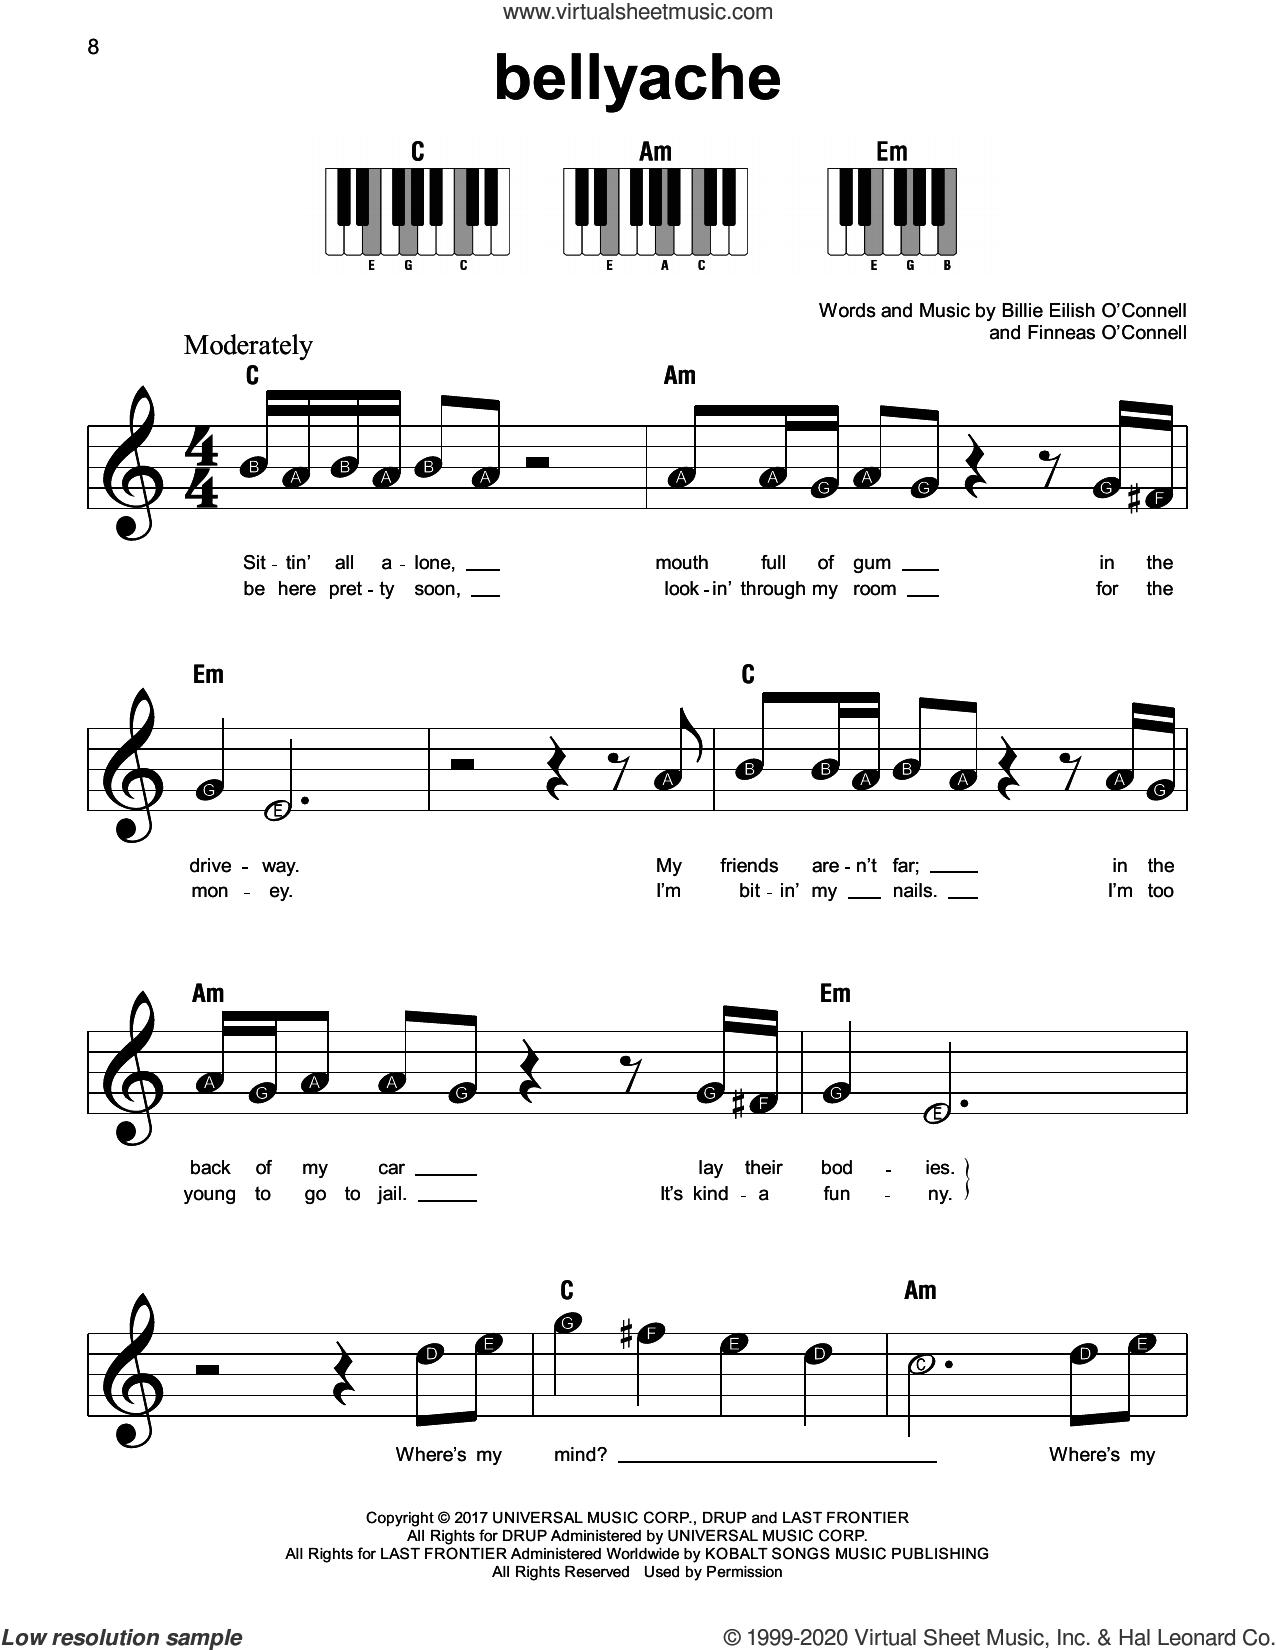 bellyache sheet music for piano solo by Billie Eilish, beginner skill level